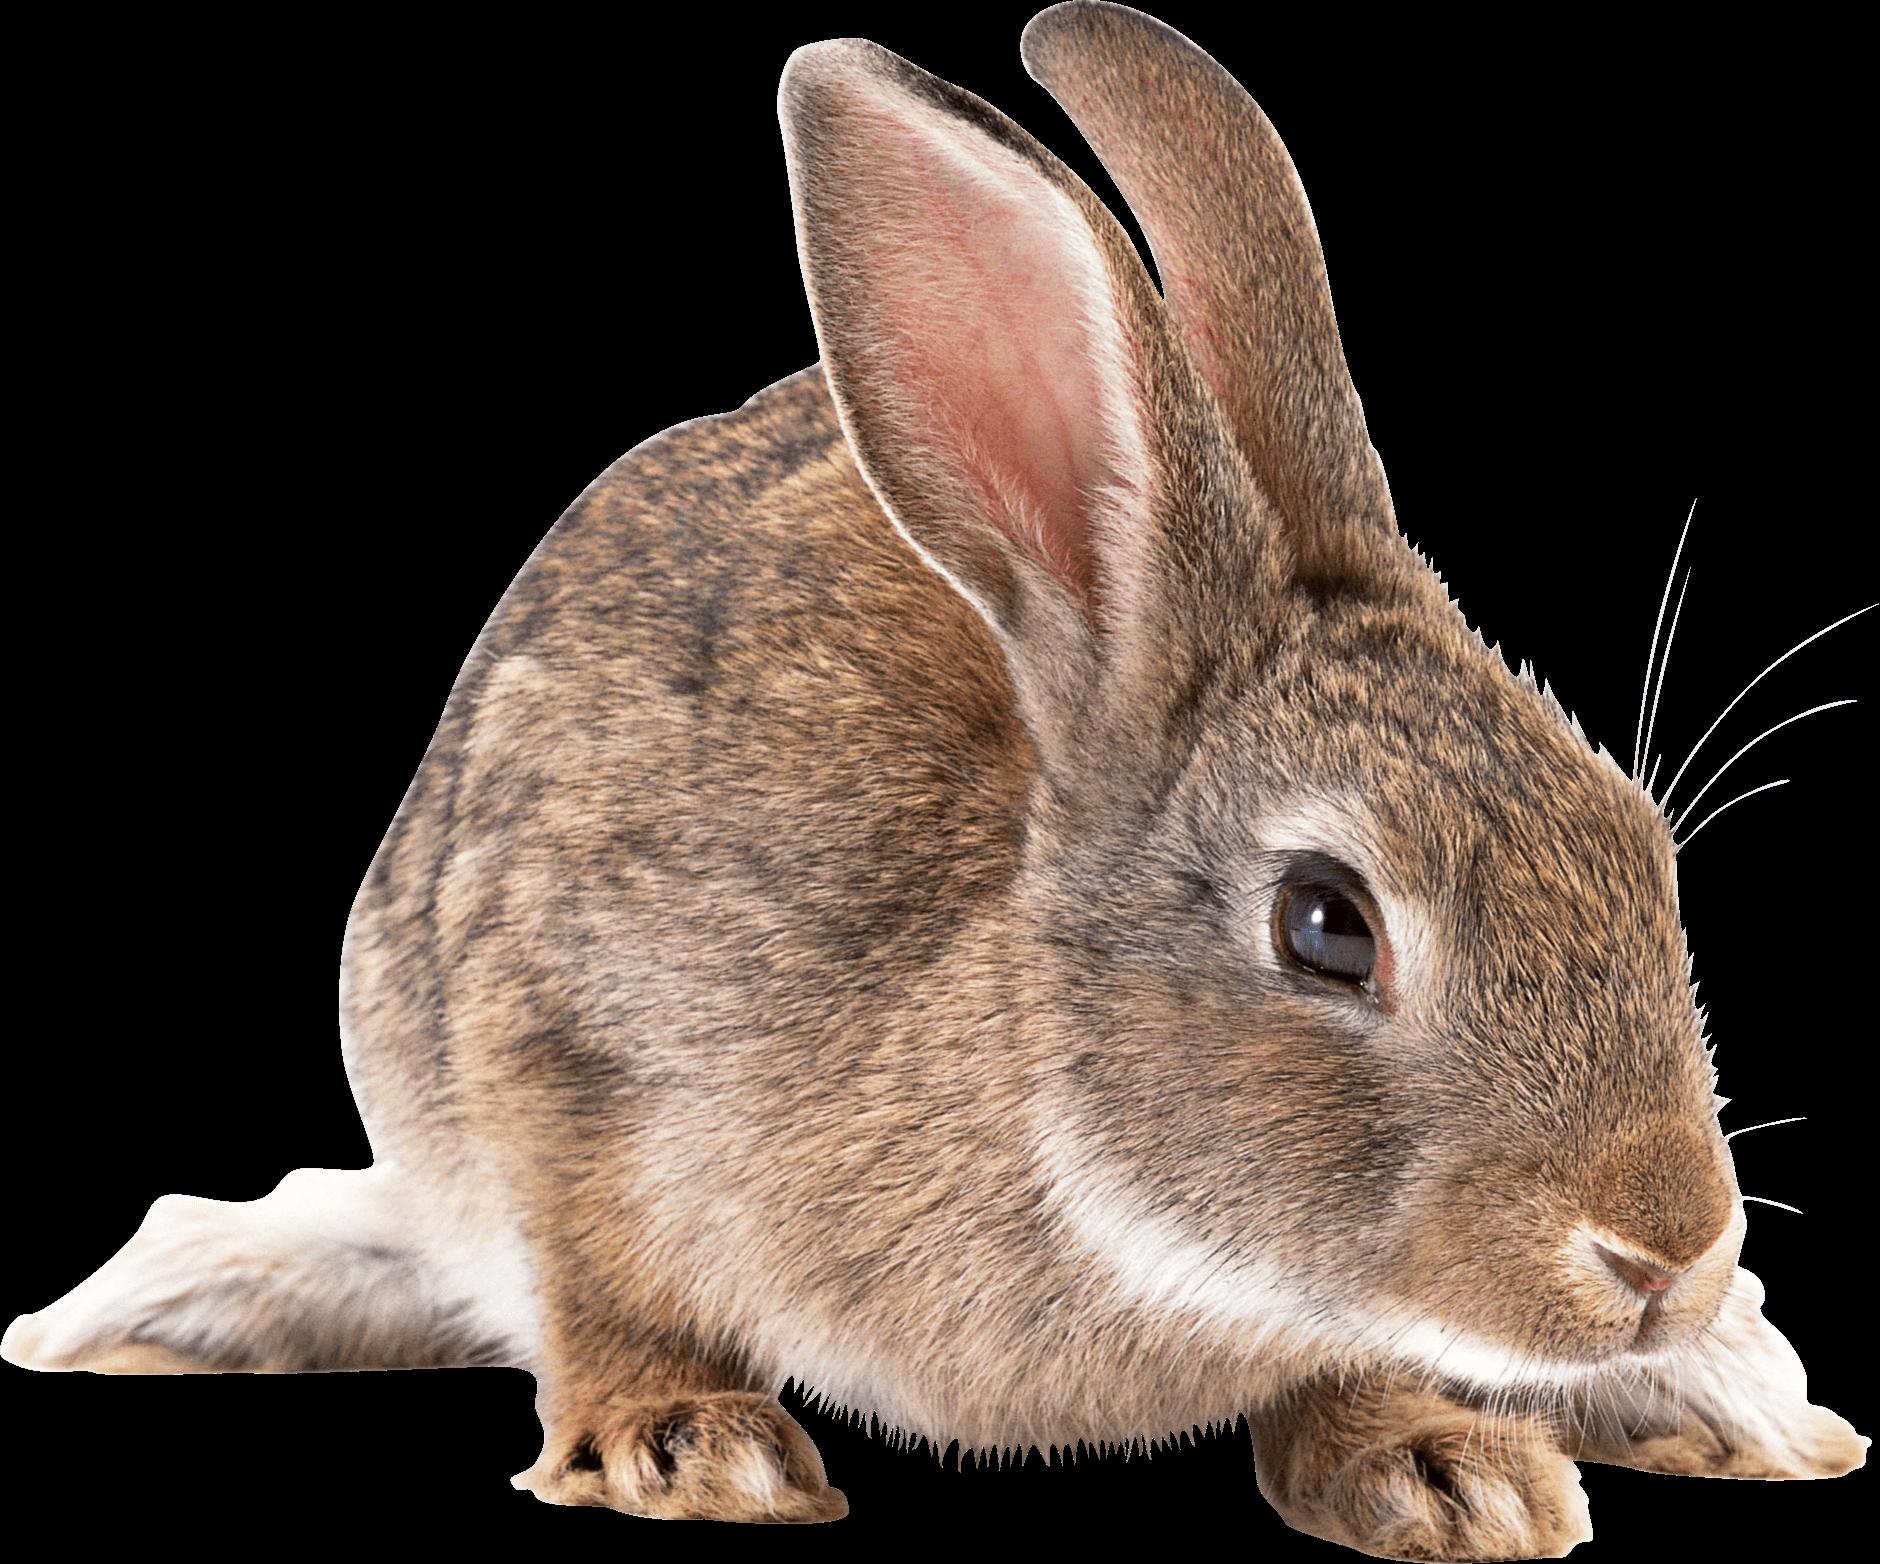 Rabbits transparent png images. Clipart bunny cottontail rabbit